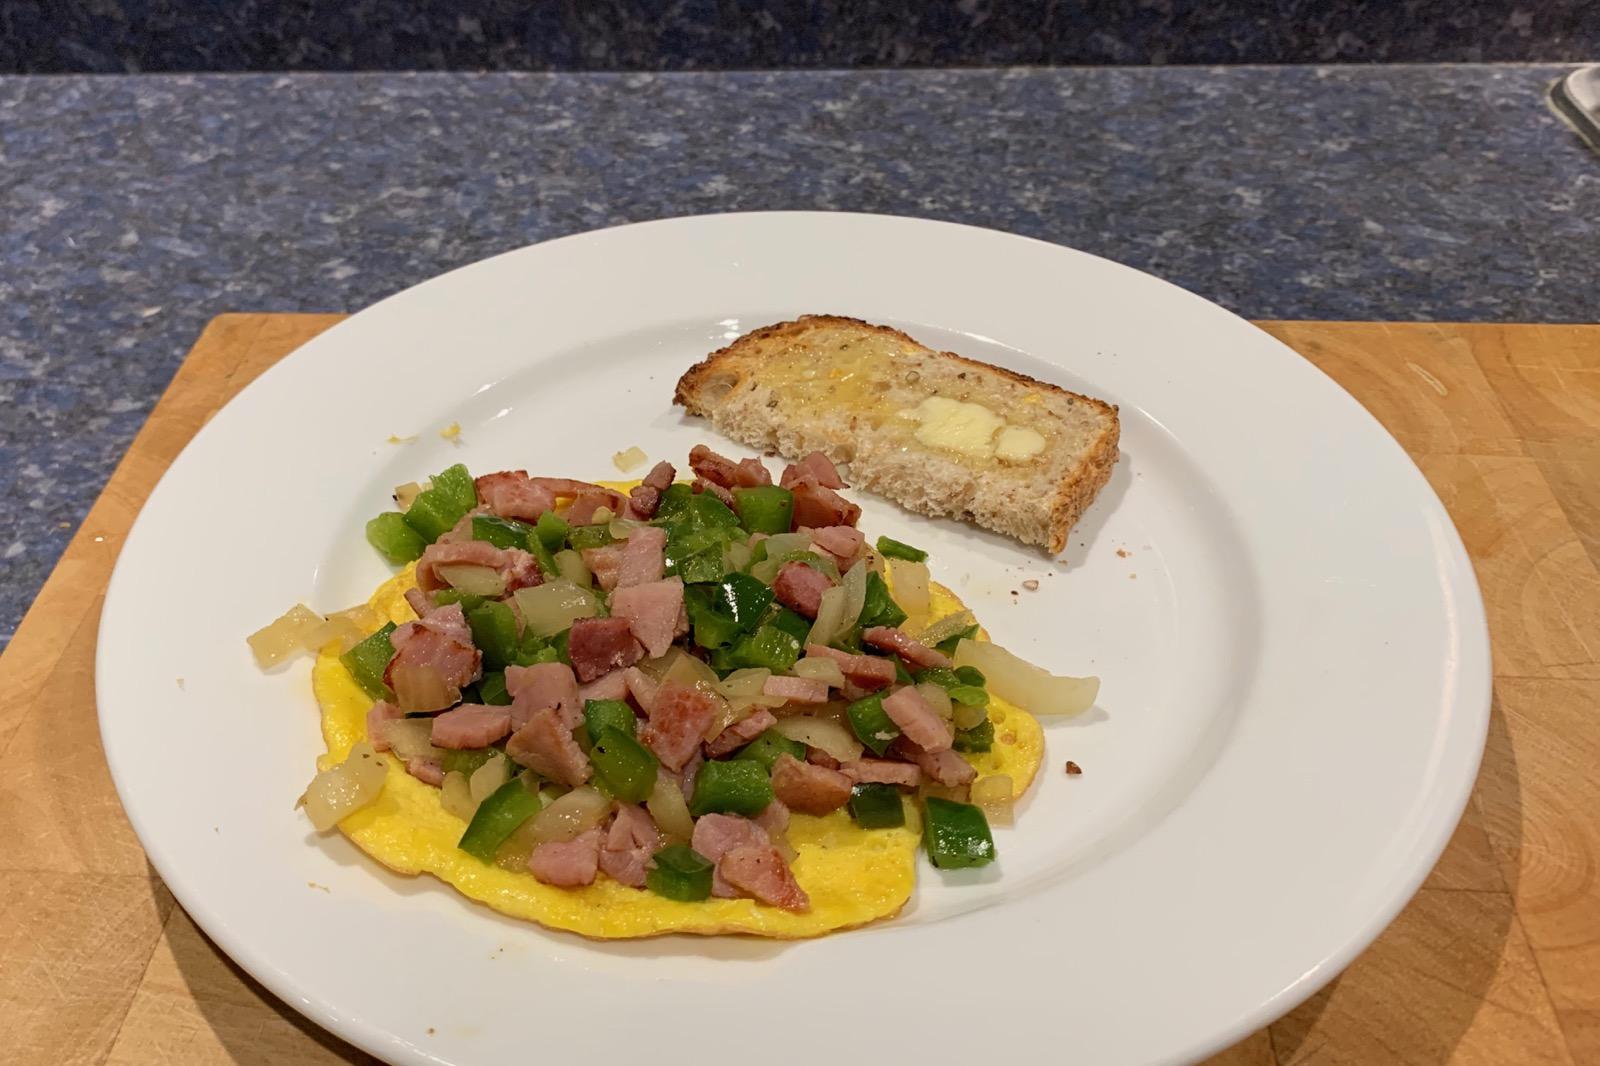 http://blog.rickk.com/food/2020/04/07/ate.2020.05.07.b.jpg